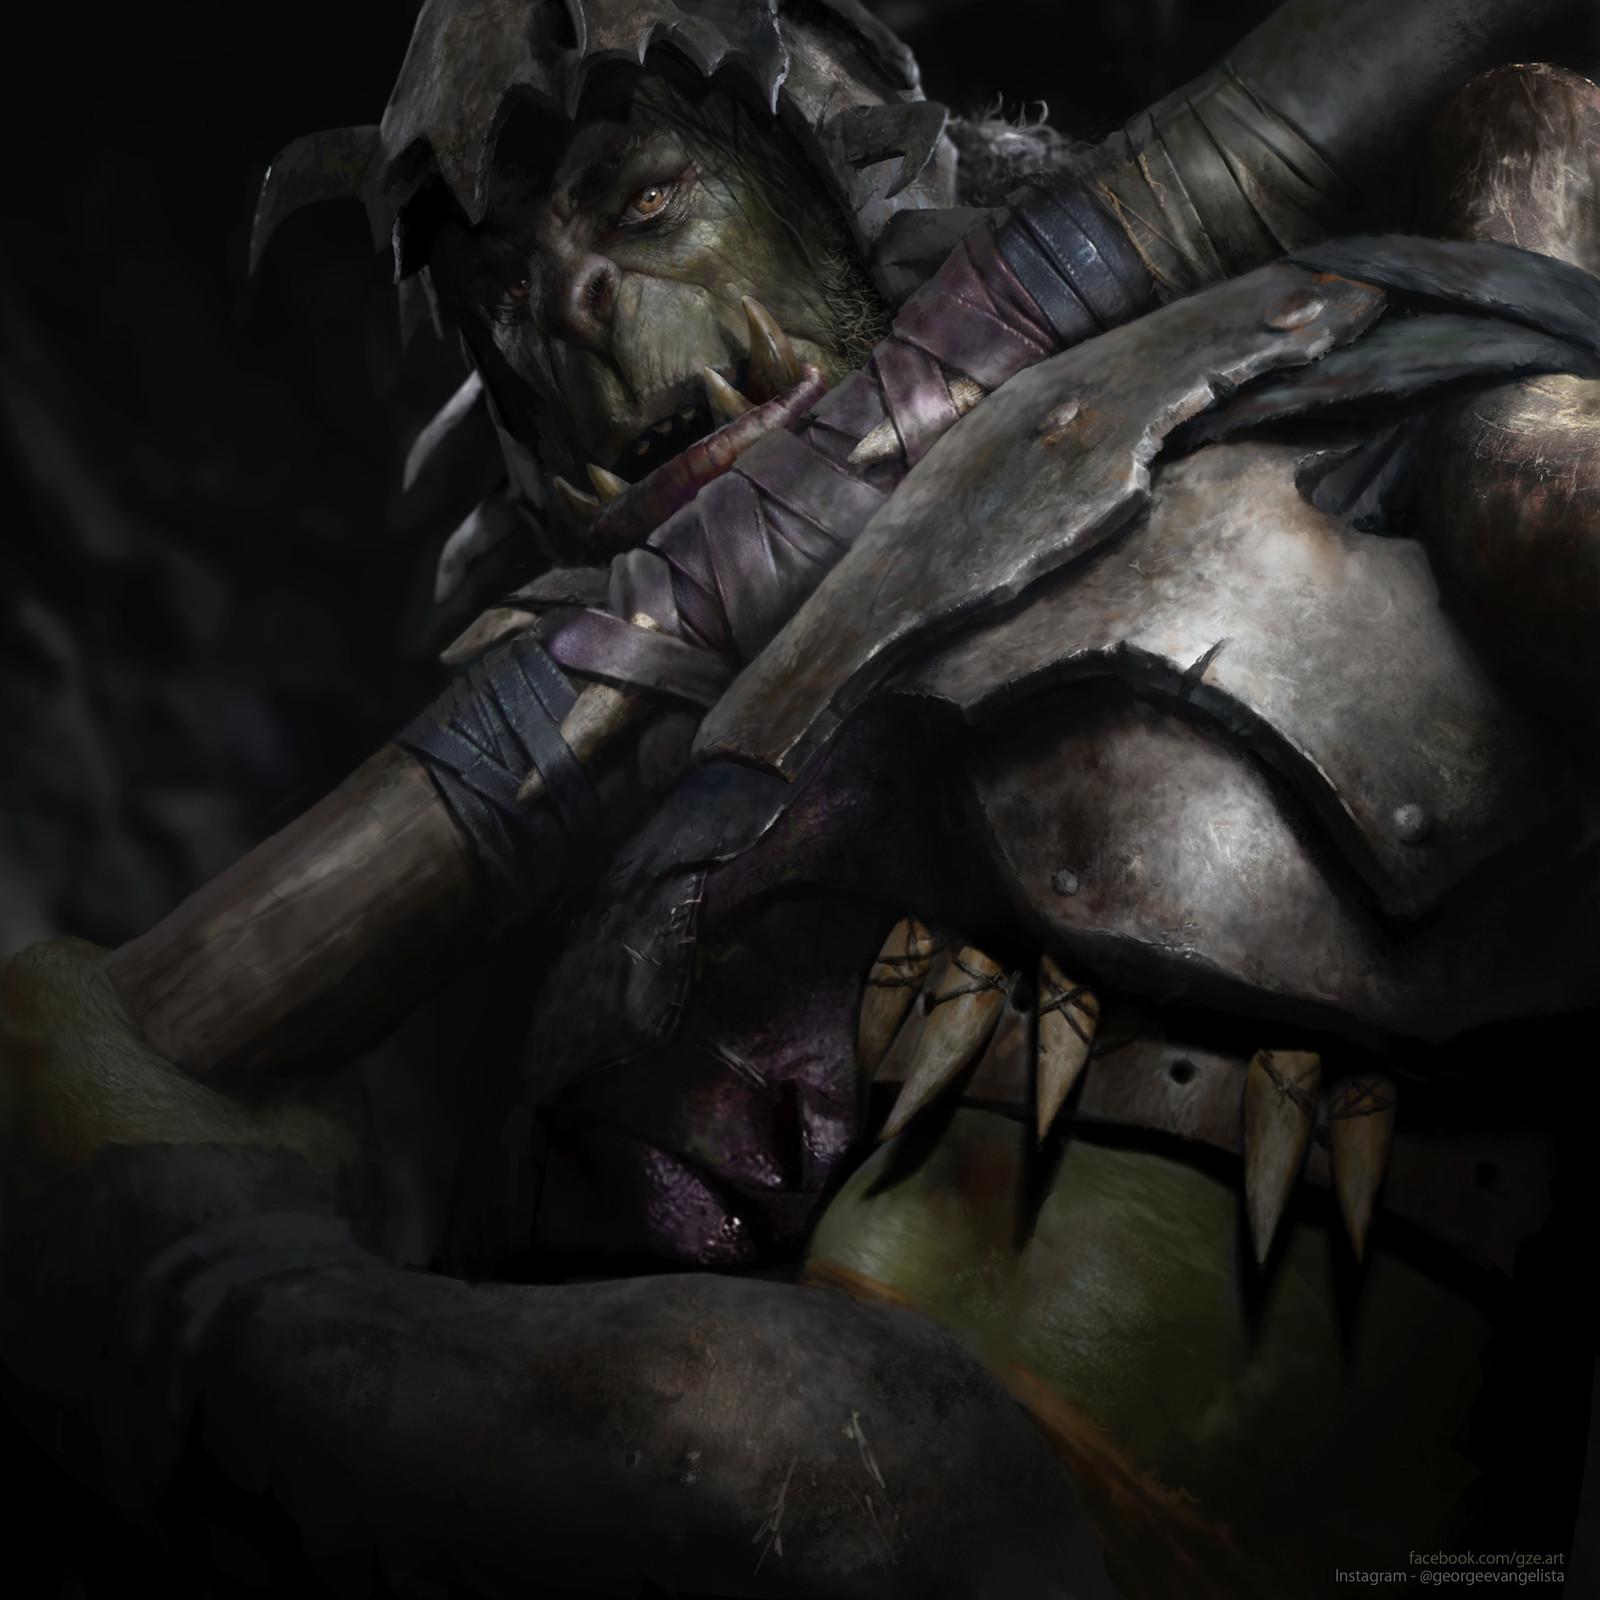 Orc - LOTR Warcraft Hybrid